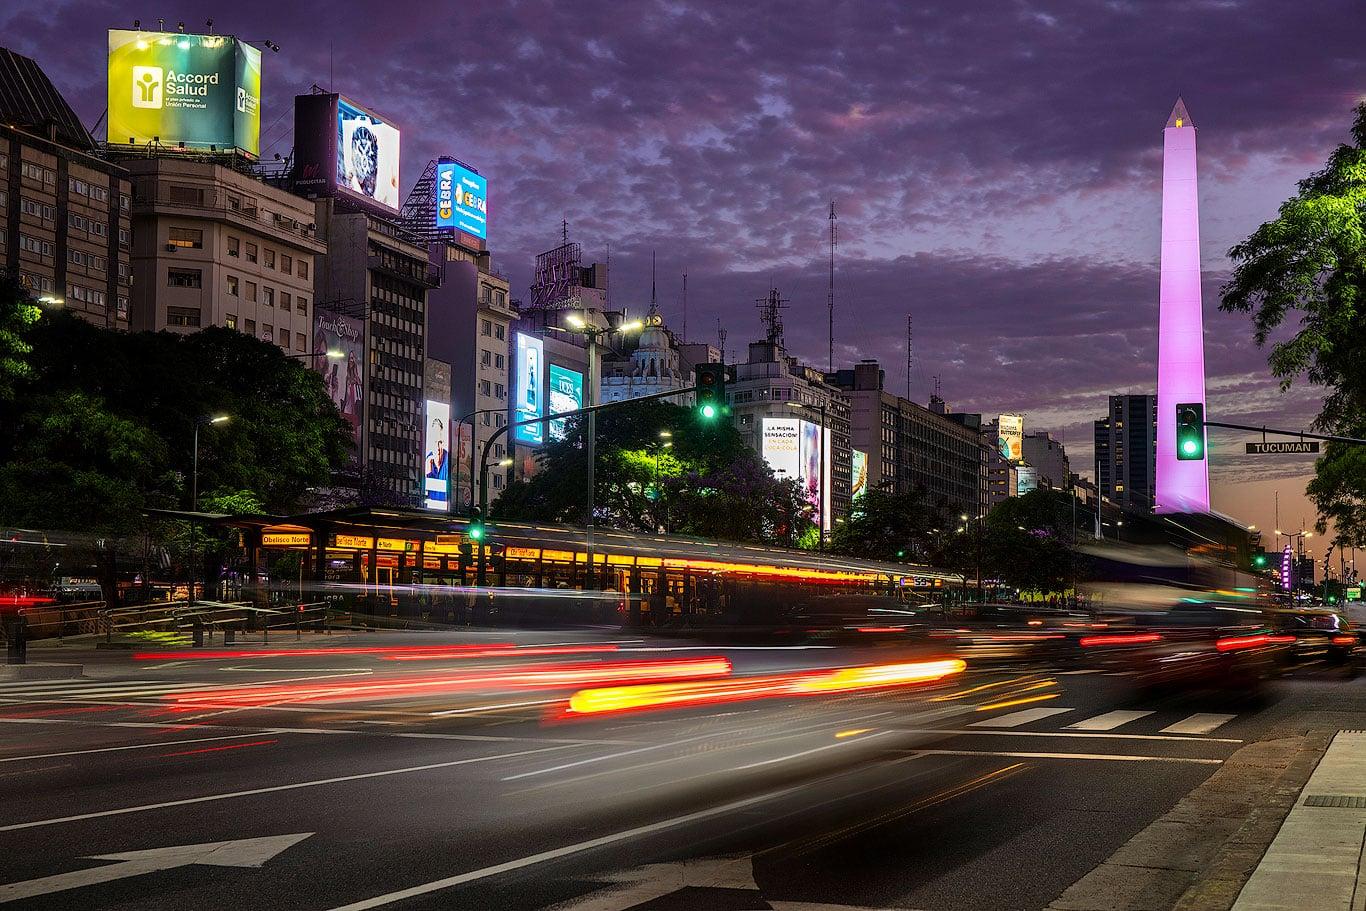 Traffic lights on Avenida 9 de Julio, Buenos Aires